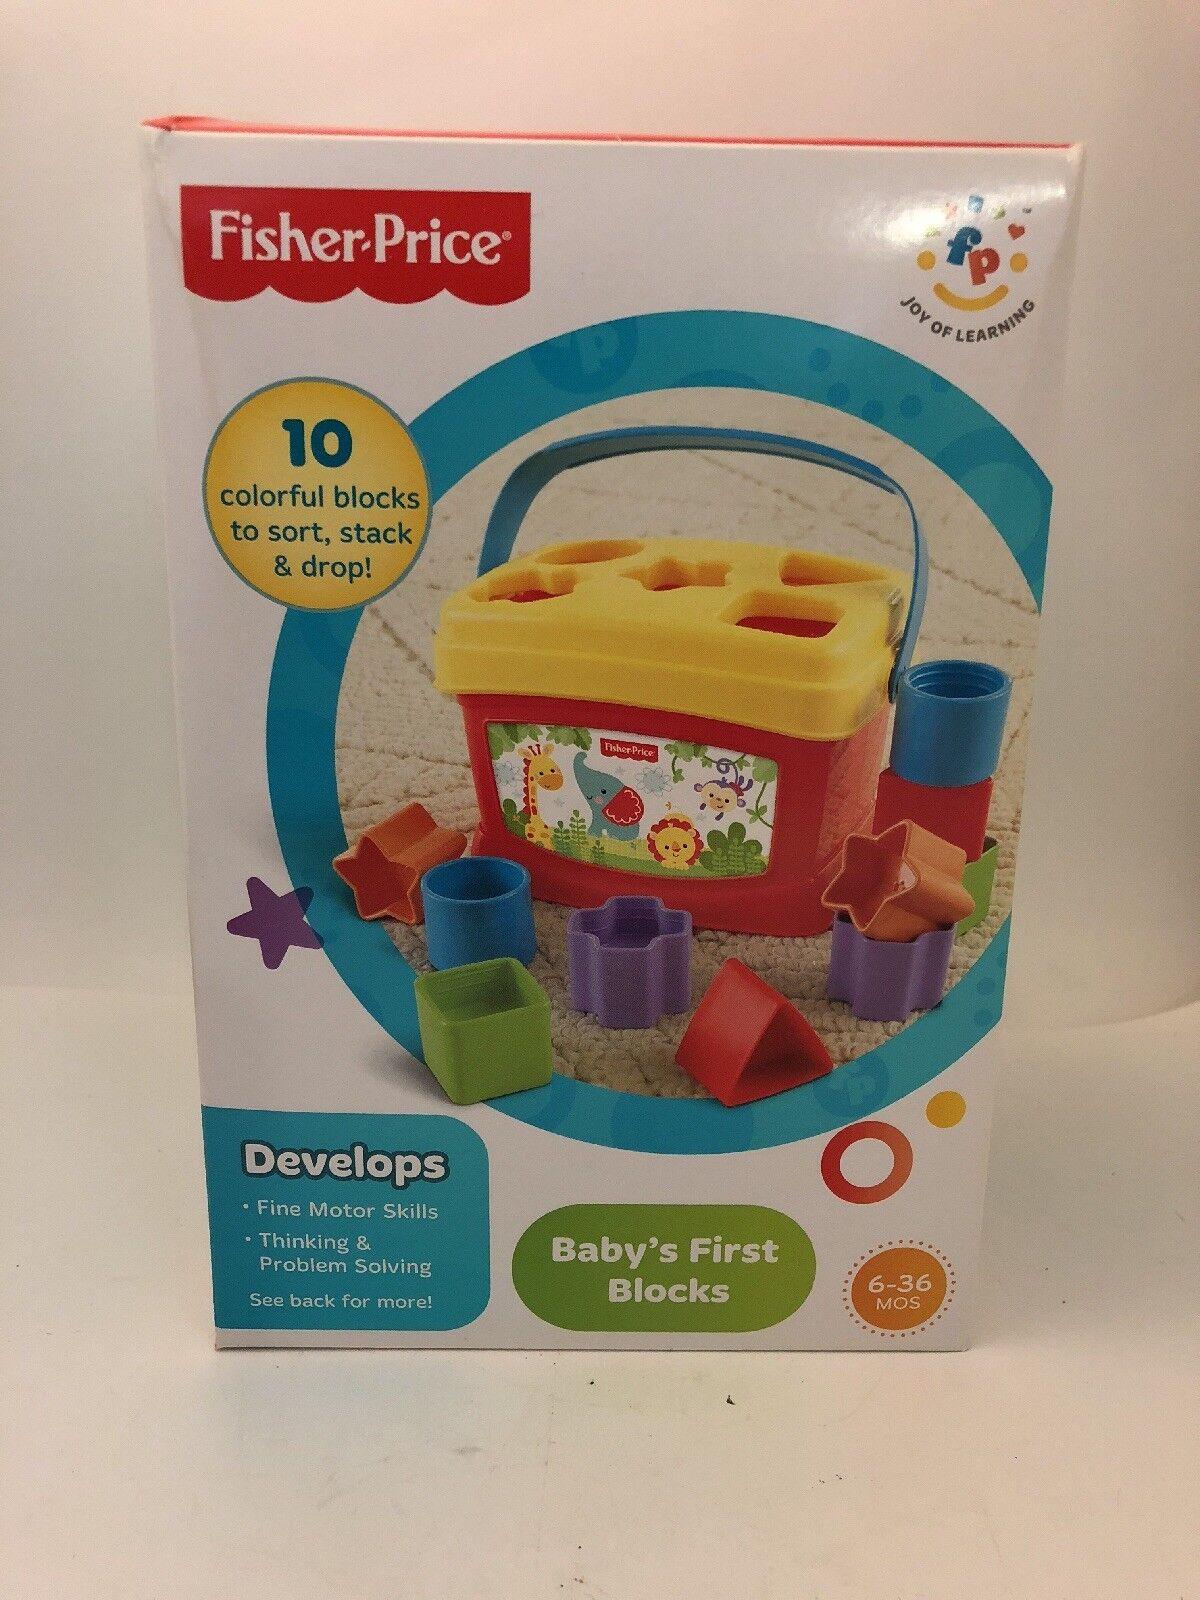 Fisher K7167 Babys First Blocks Unknown Ebay Price Baby Block Norton Secured Powered By Verisign